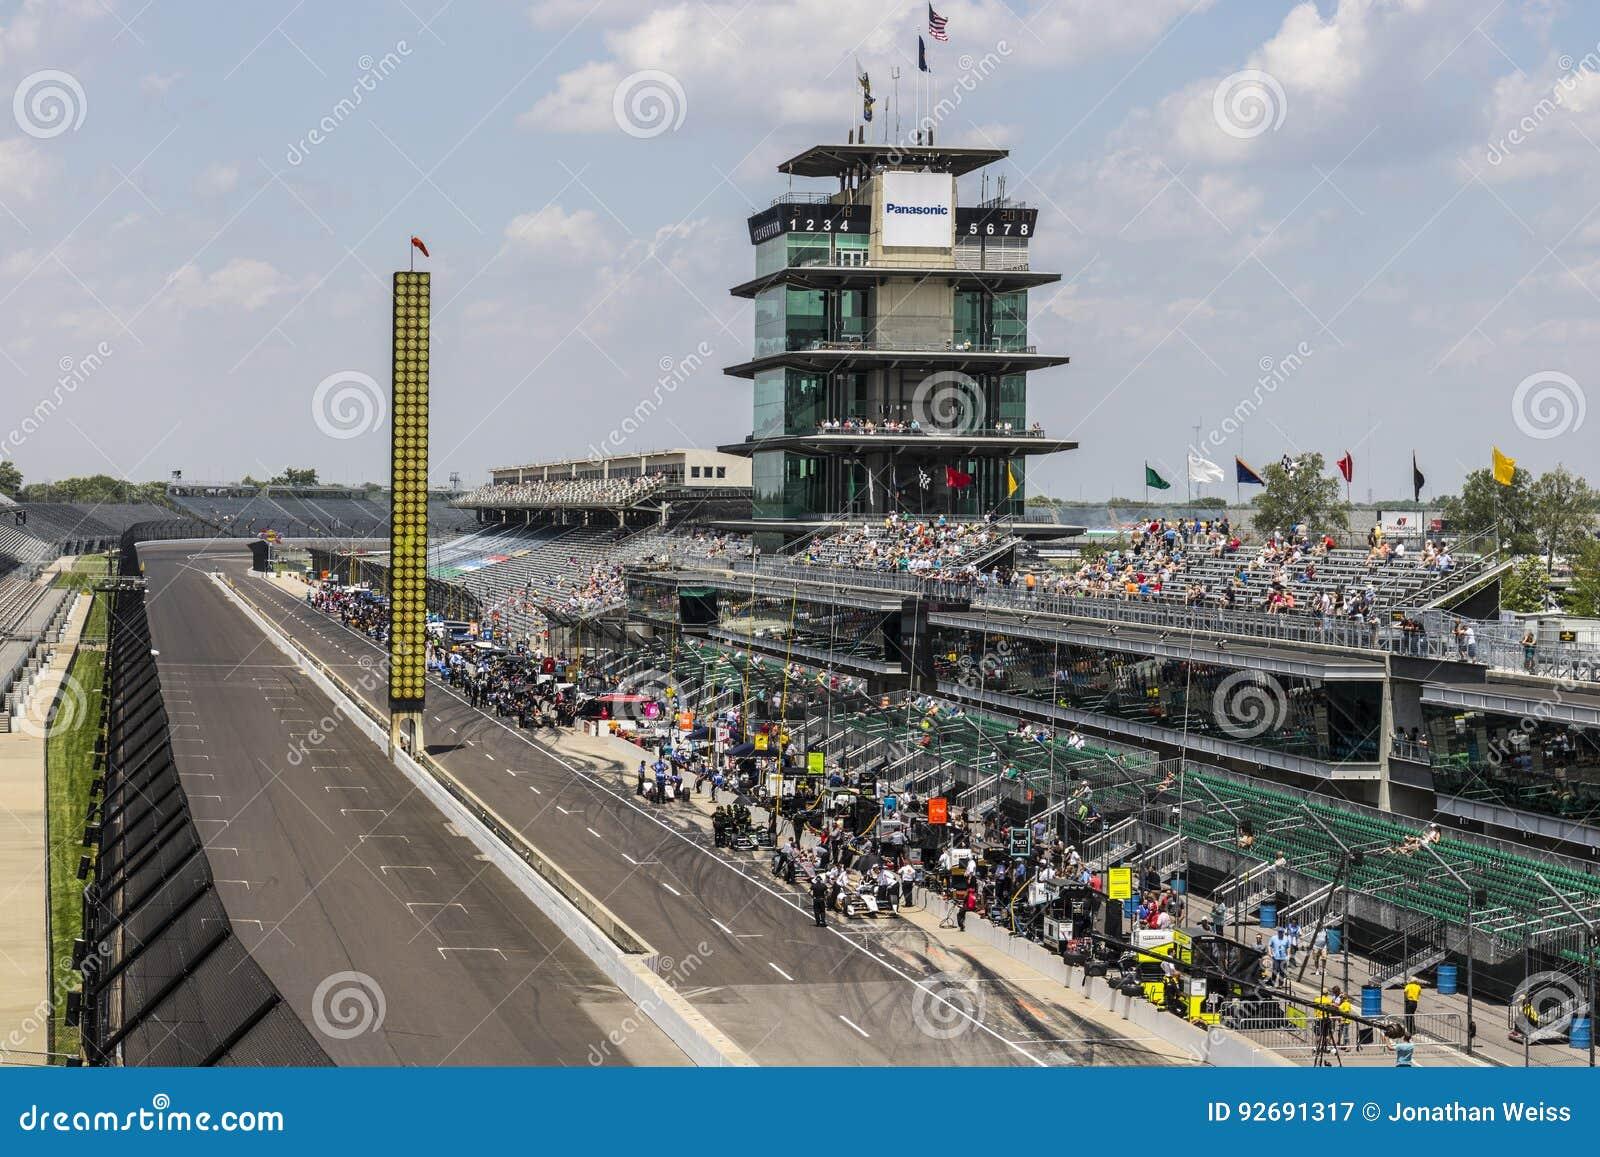 Indianapolis - circa im Mai 2017: Die Panasonic-Pagode in Indianapolis Motor Speedway IMS bereitet für des Indy 500 IV vor